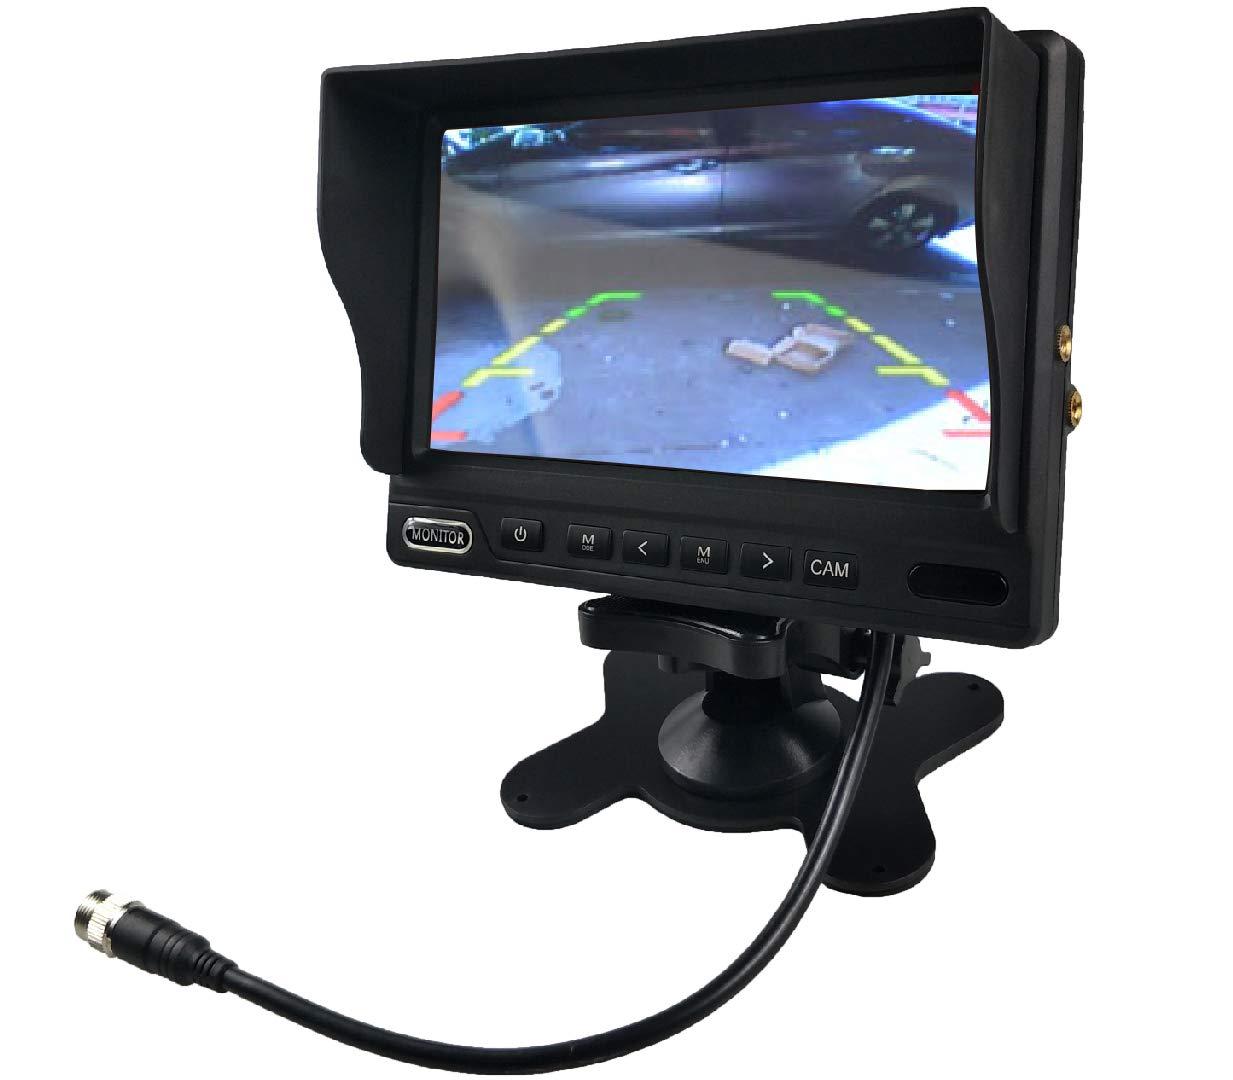 Monitor LCD en Espejo de 4.3 Pulgadas C/ámara Impermeable Visi/ón Nocturna 8 Leds Sistema de visi/ón Trasera ITK TECHNOLOGY ITKC650T430 Pantalla con l/íneas de gu/ía